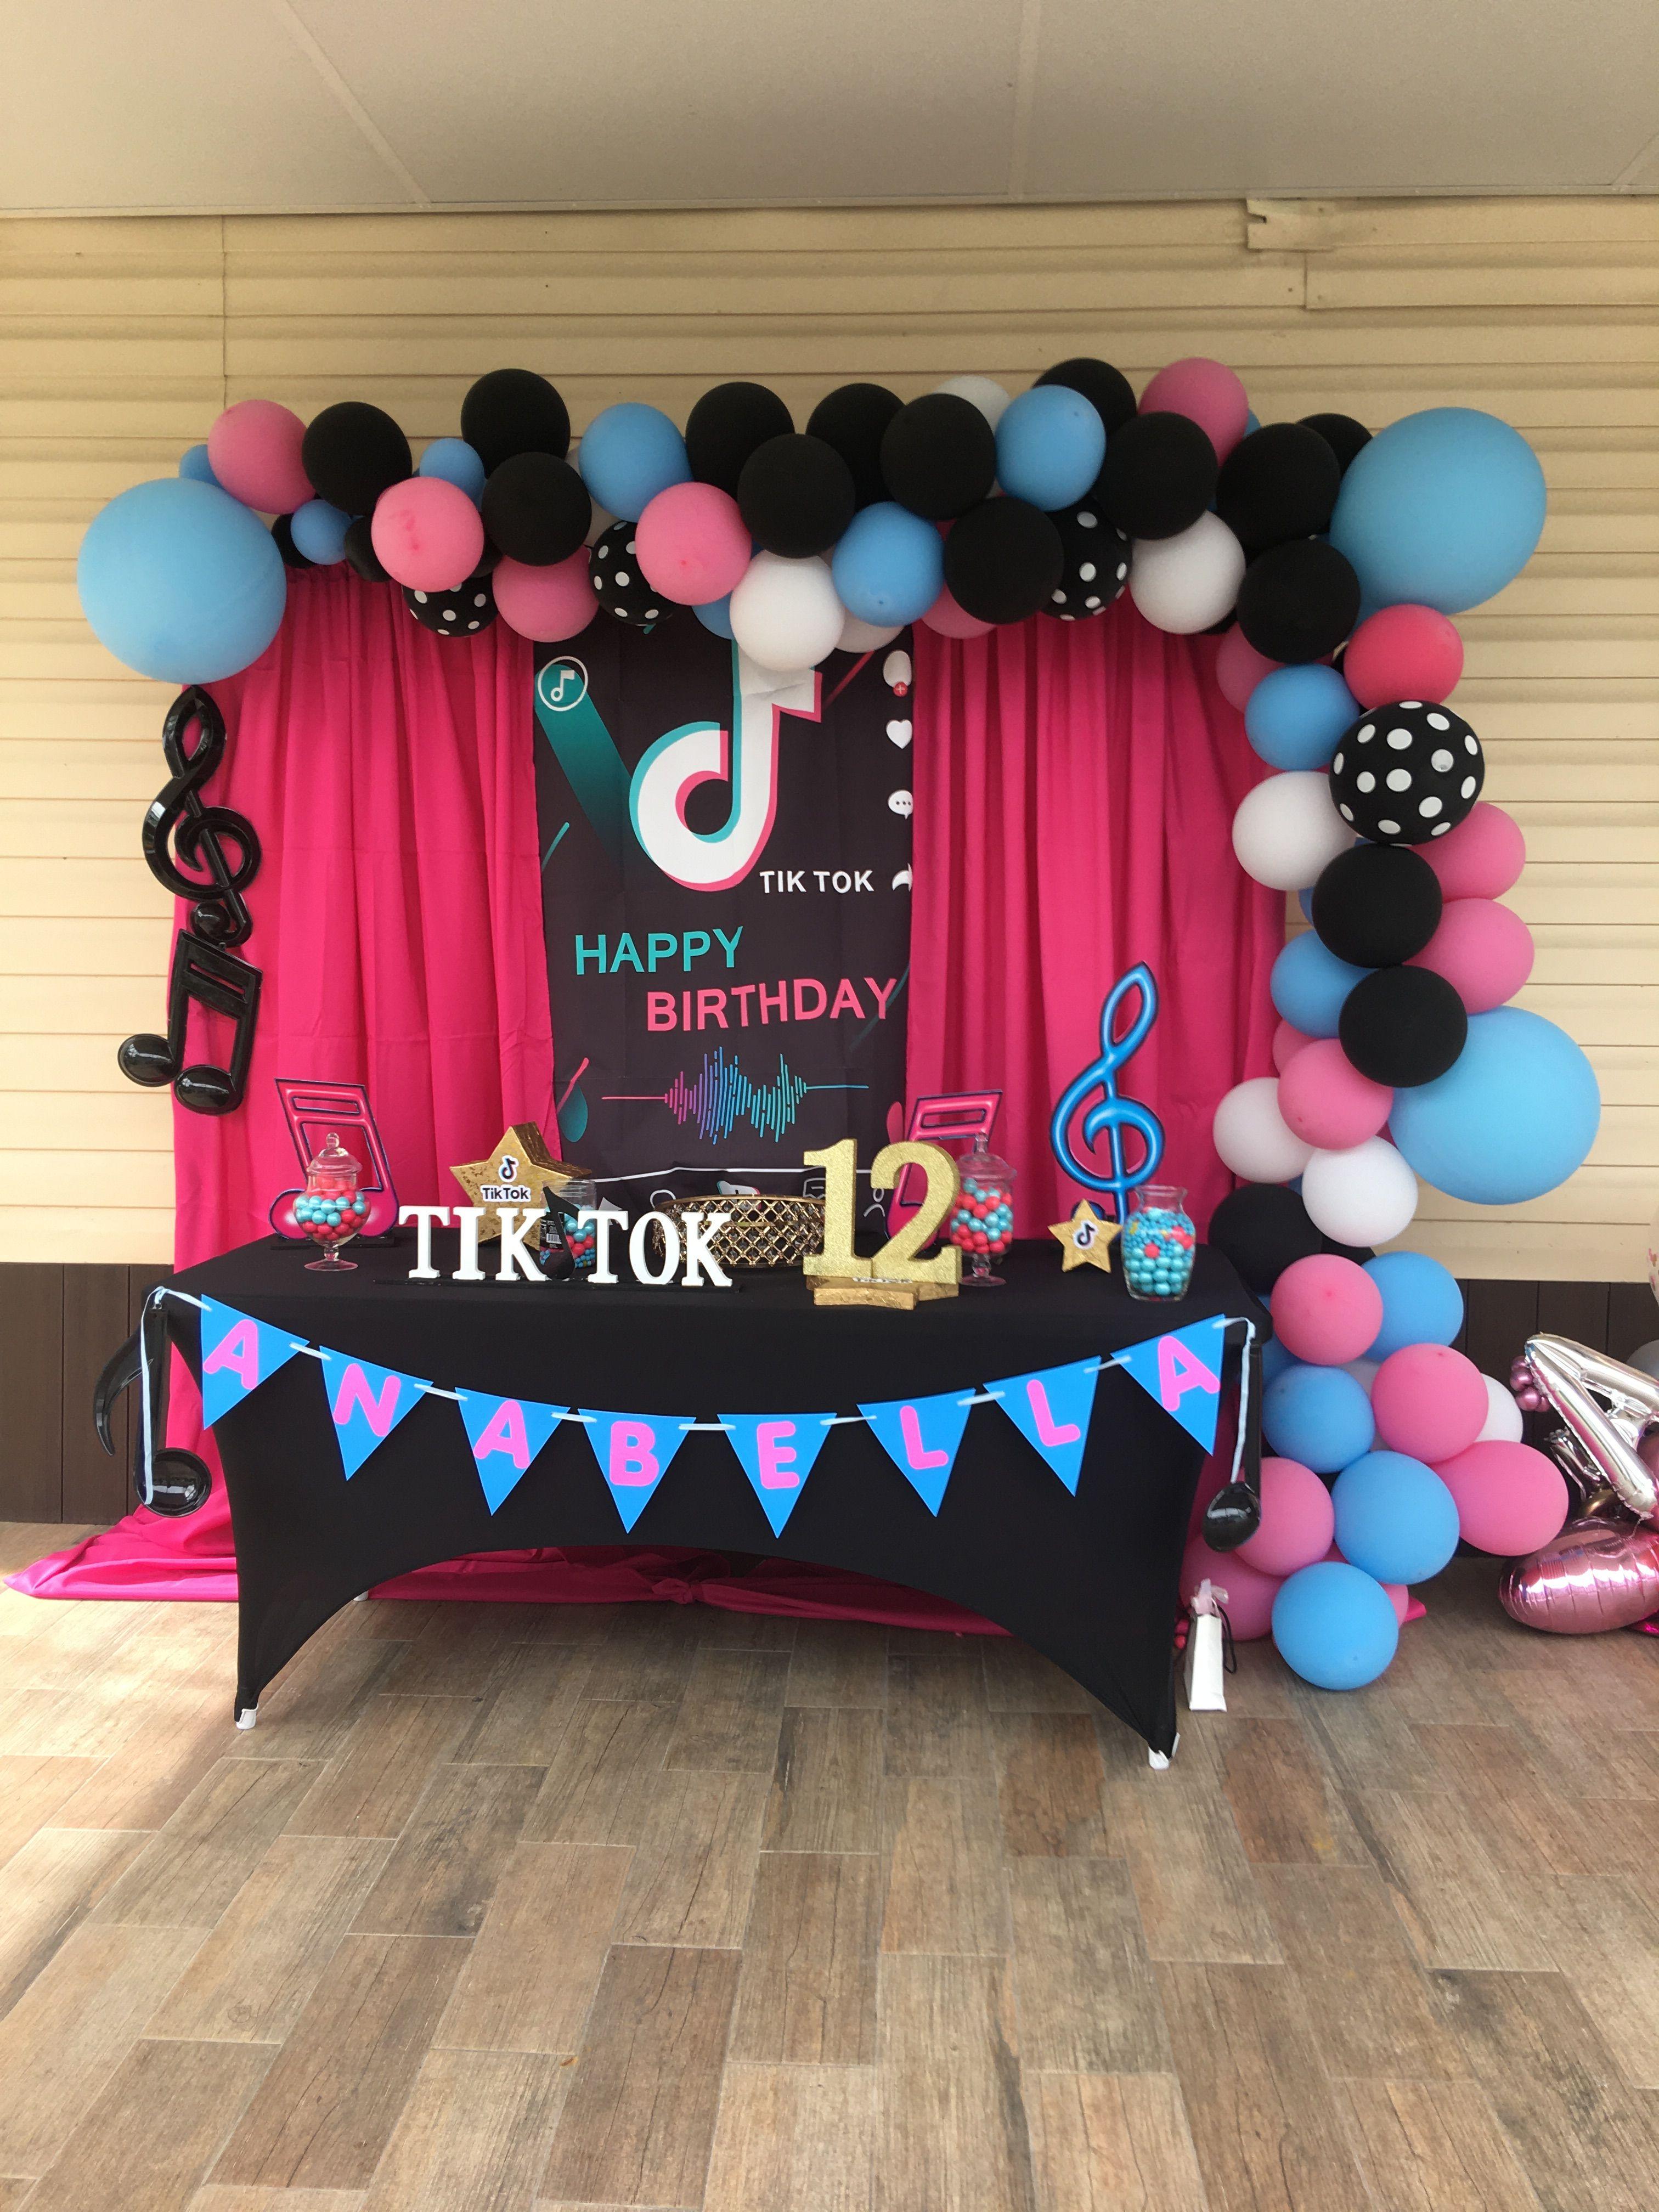 Tiktok Photo Booth Backdrop Birthday Party Themes Photo Booth Backdrop Backdrops For Parties